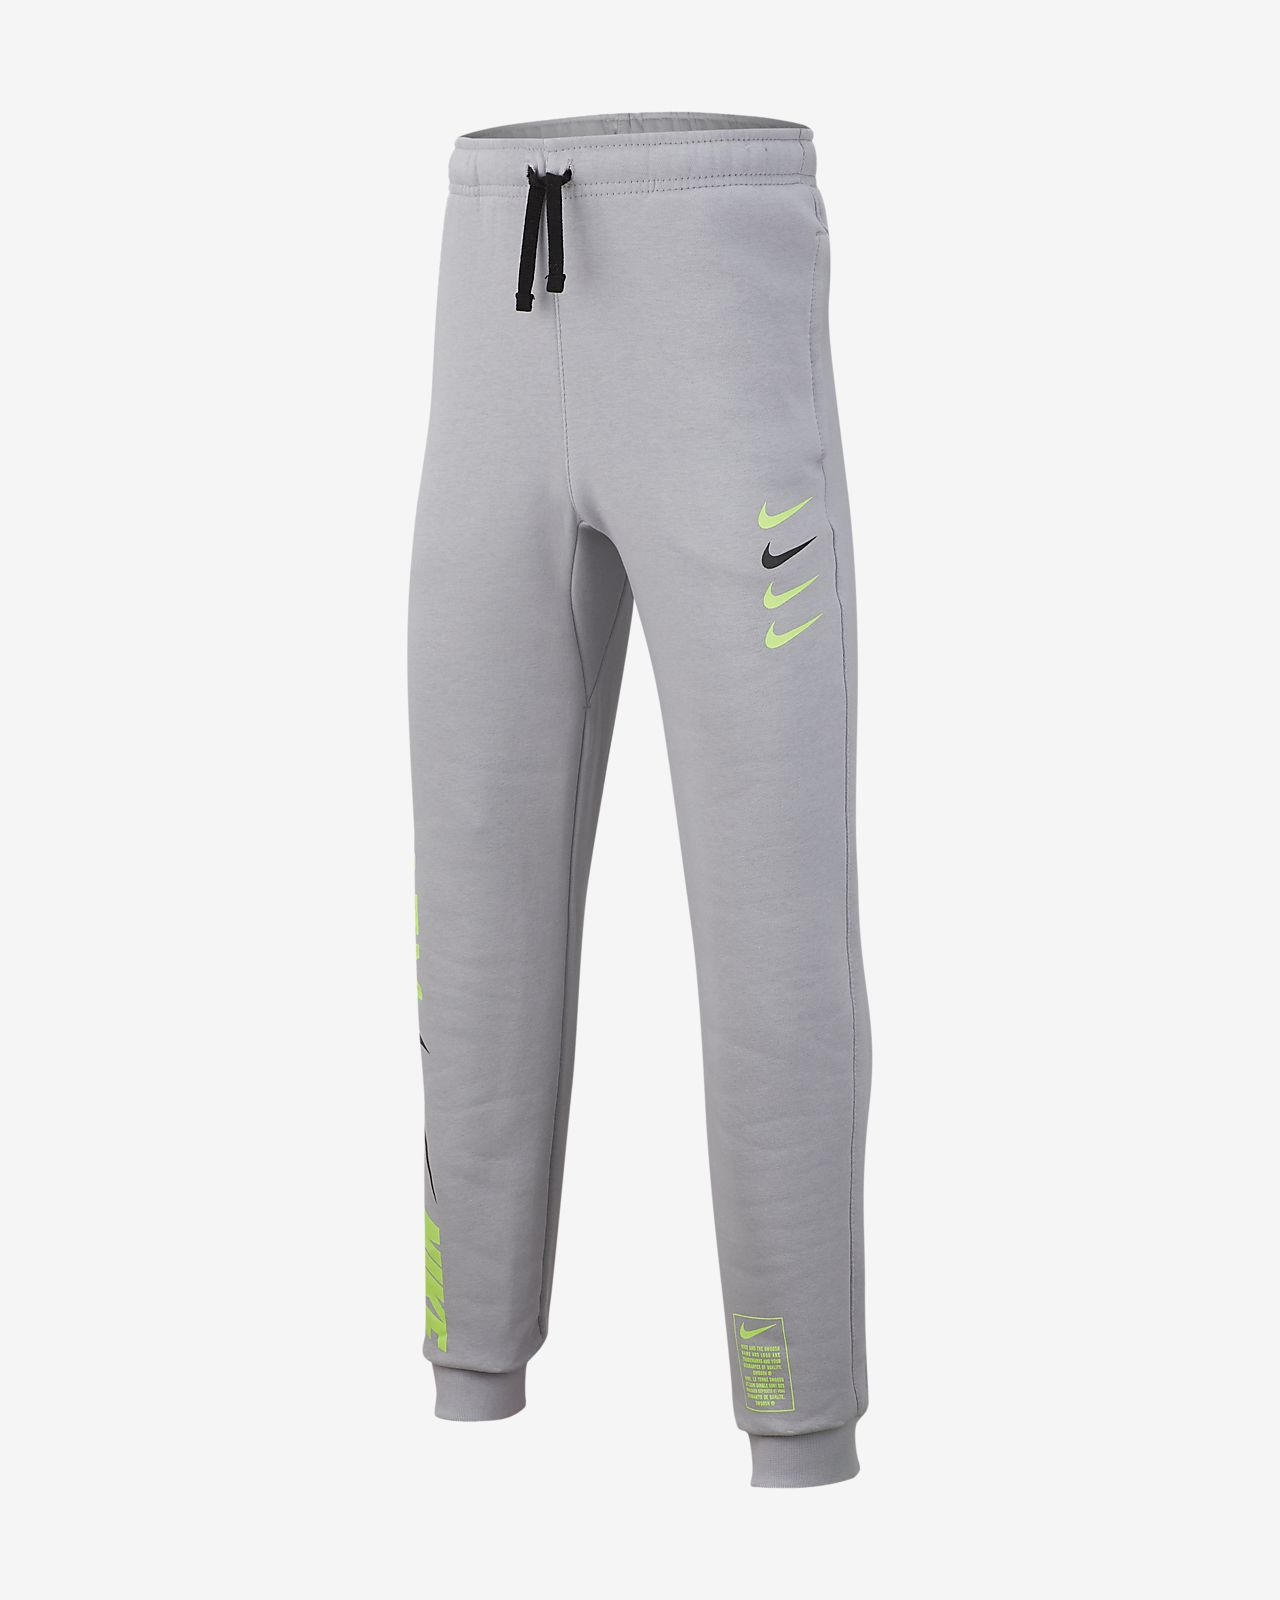 aad2f07271bcc2 Nike Sportswear Club Fleece Big Kids  (Boys ) Joggers. Nike.com